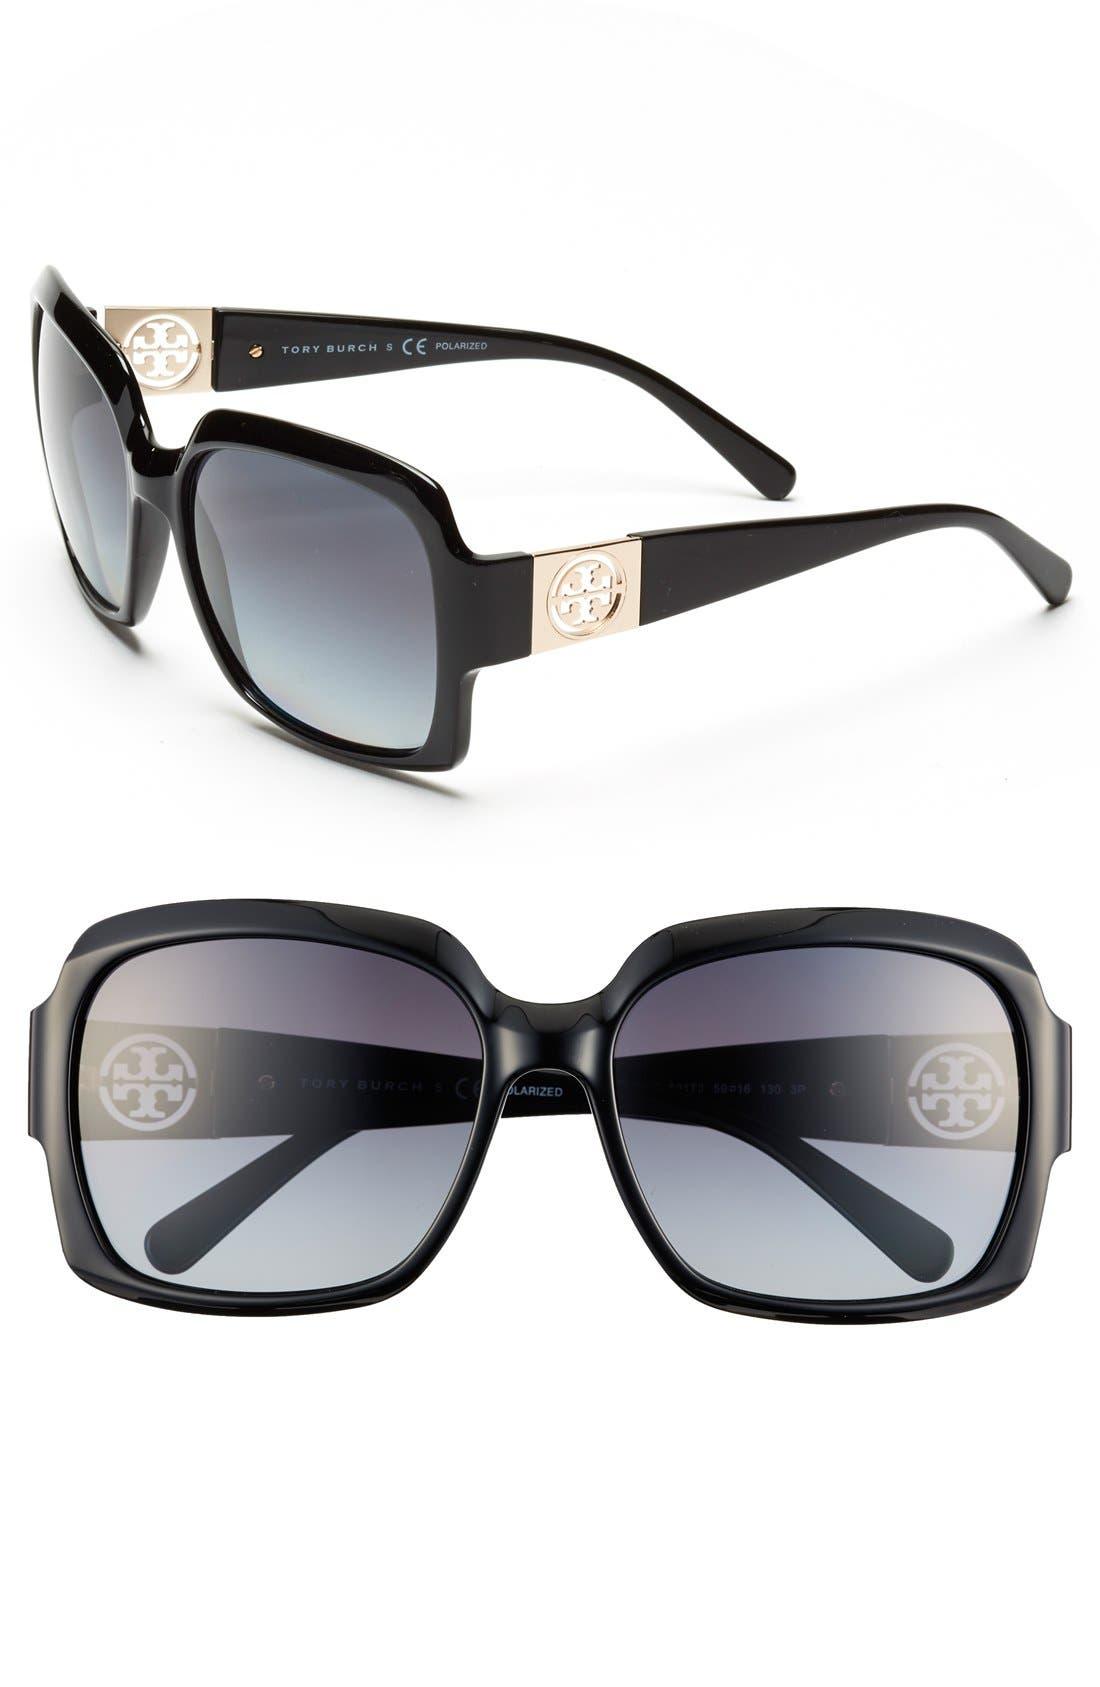 Main Image - Tory Burch 59mm Polarized Sunglasses